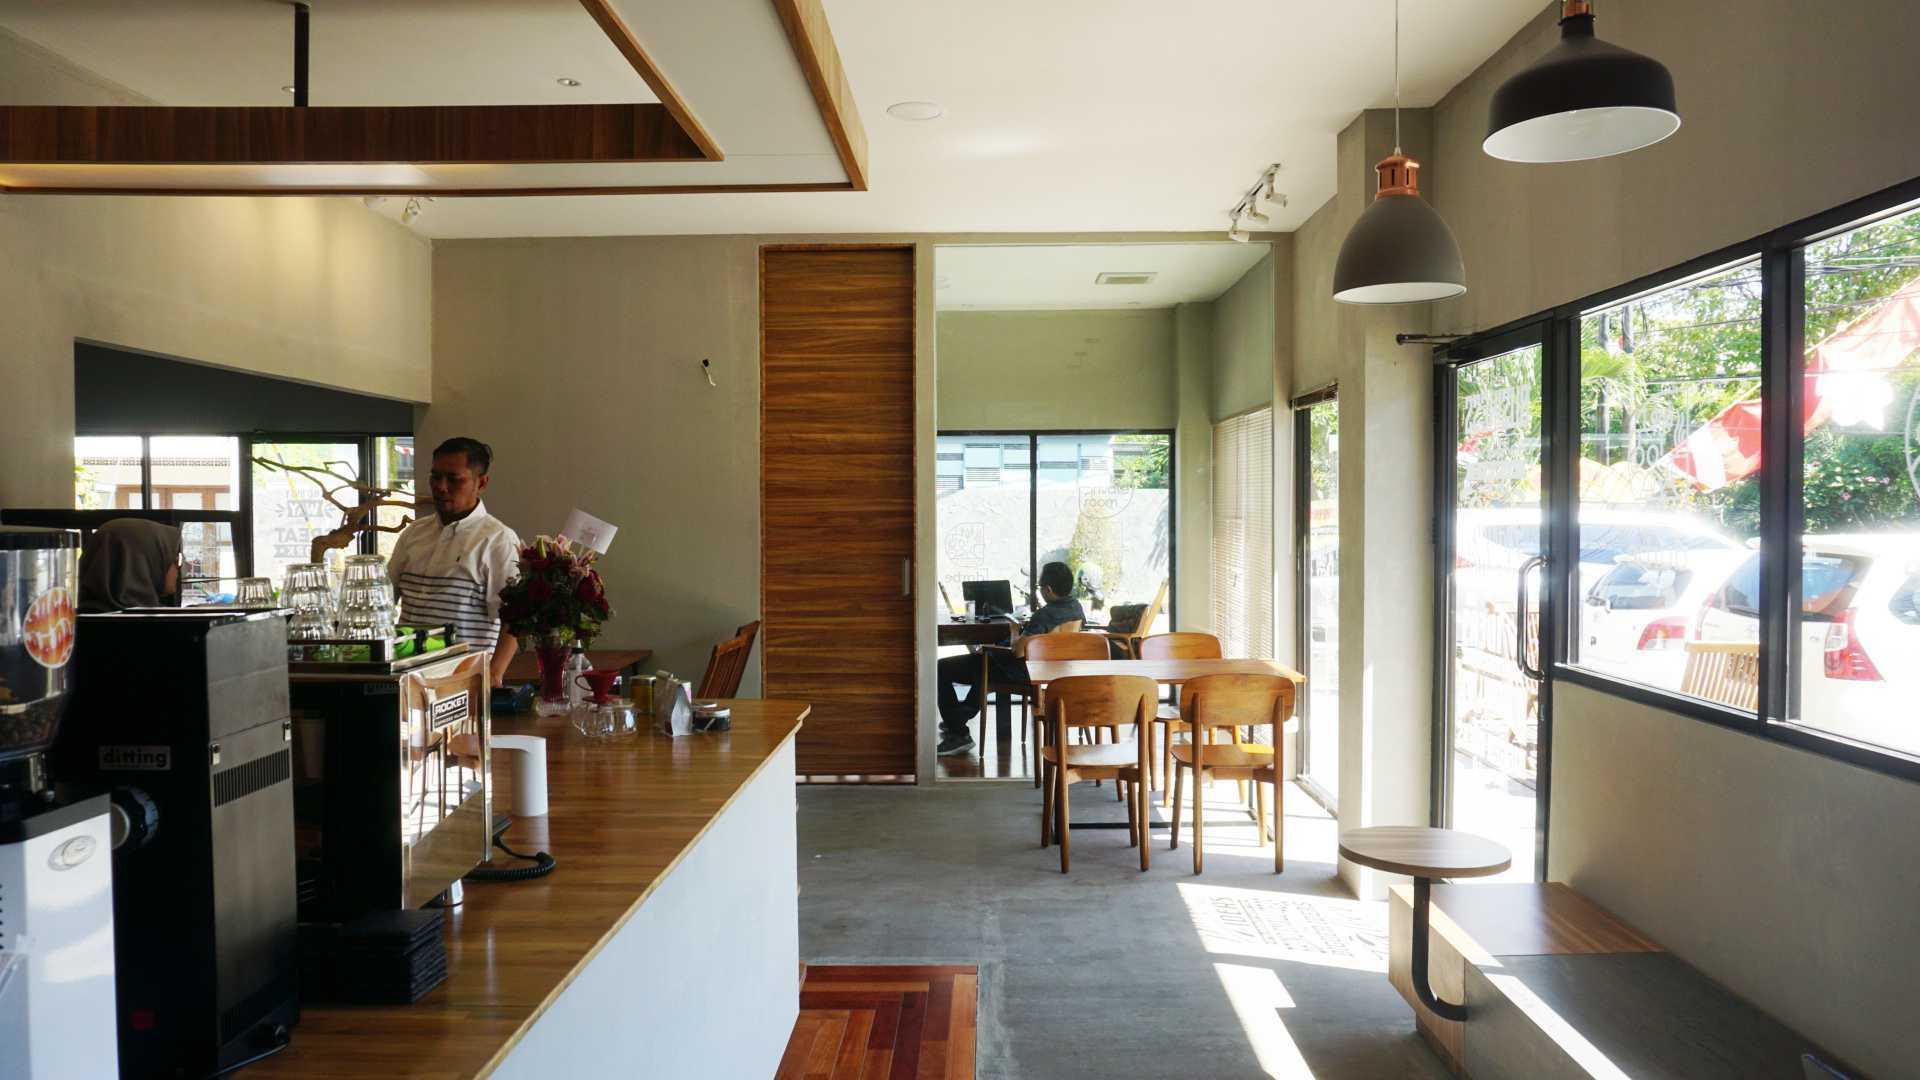 Sekala Darbe Cafe & Office, Surabaya Surabaya, Kota Sby, Jawa Timur, Indonesia Surabaya, Kota Sby, Jawa Timur, Indonesia Sekala-Drabe-Cafe-Office  97780